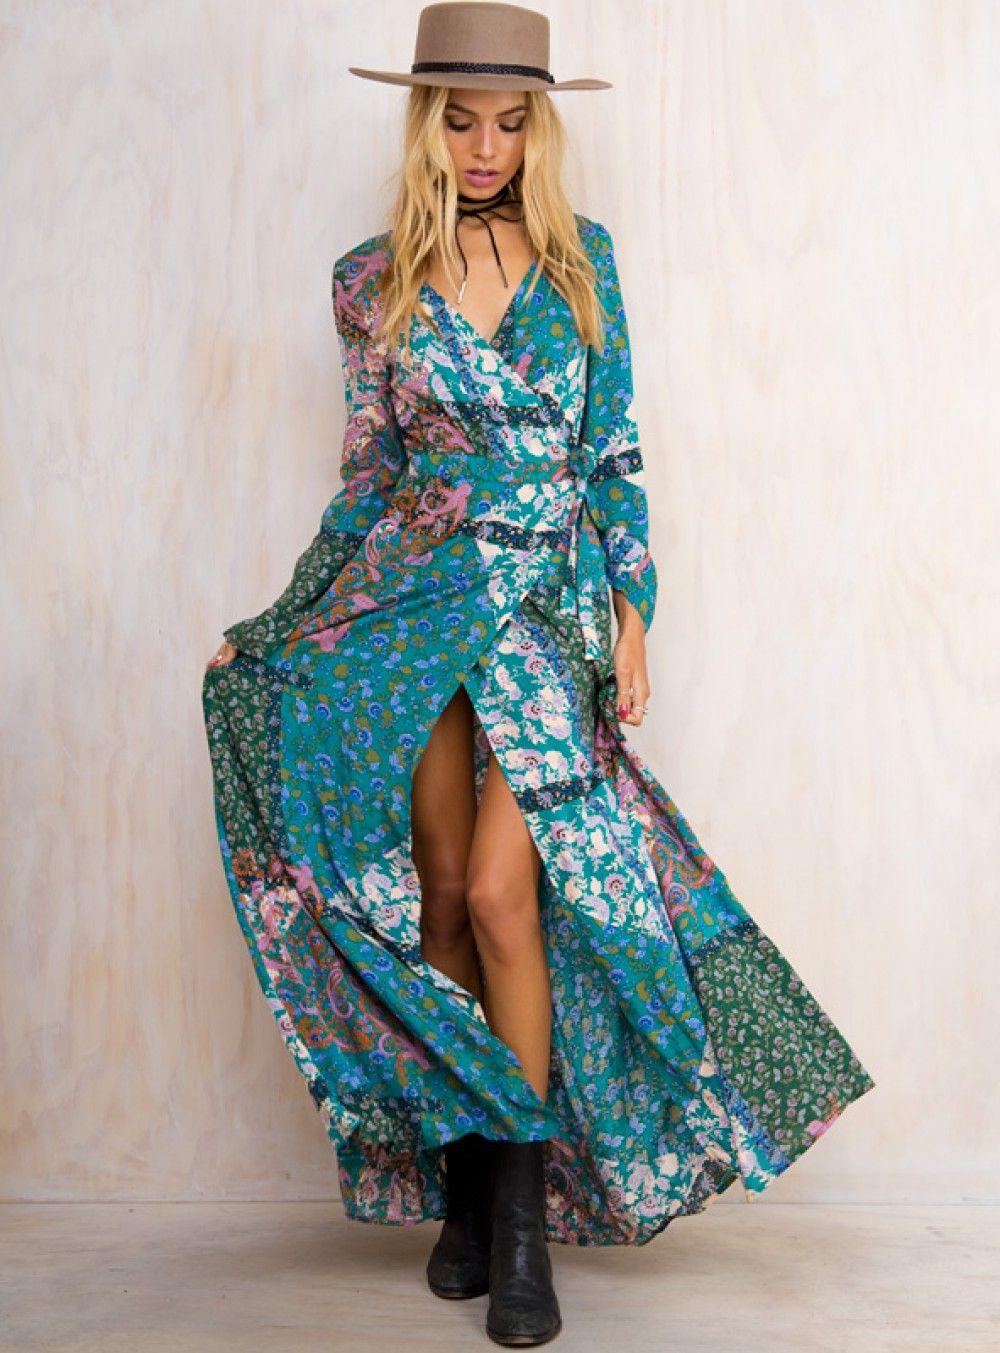 Opal Fern Maxi Dress Dresses Pinterest Maxi Dresses